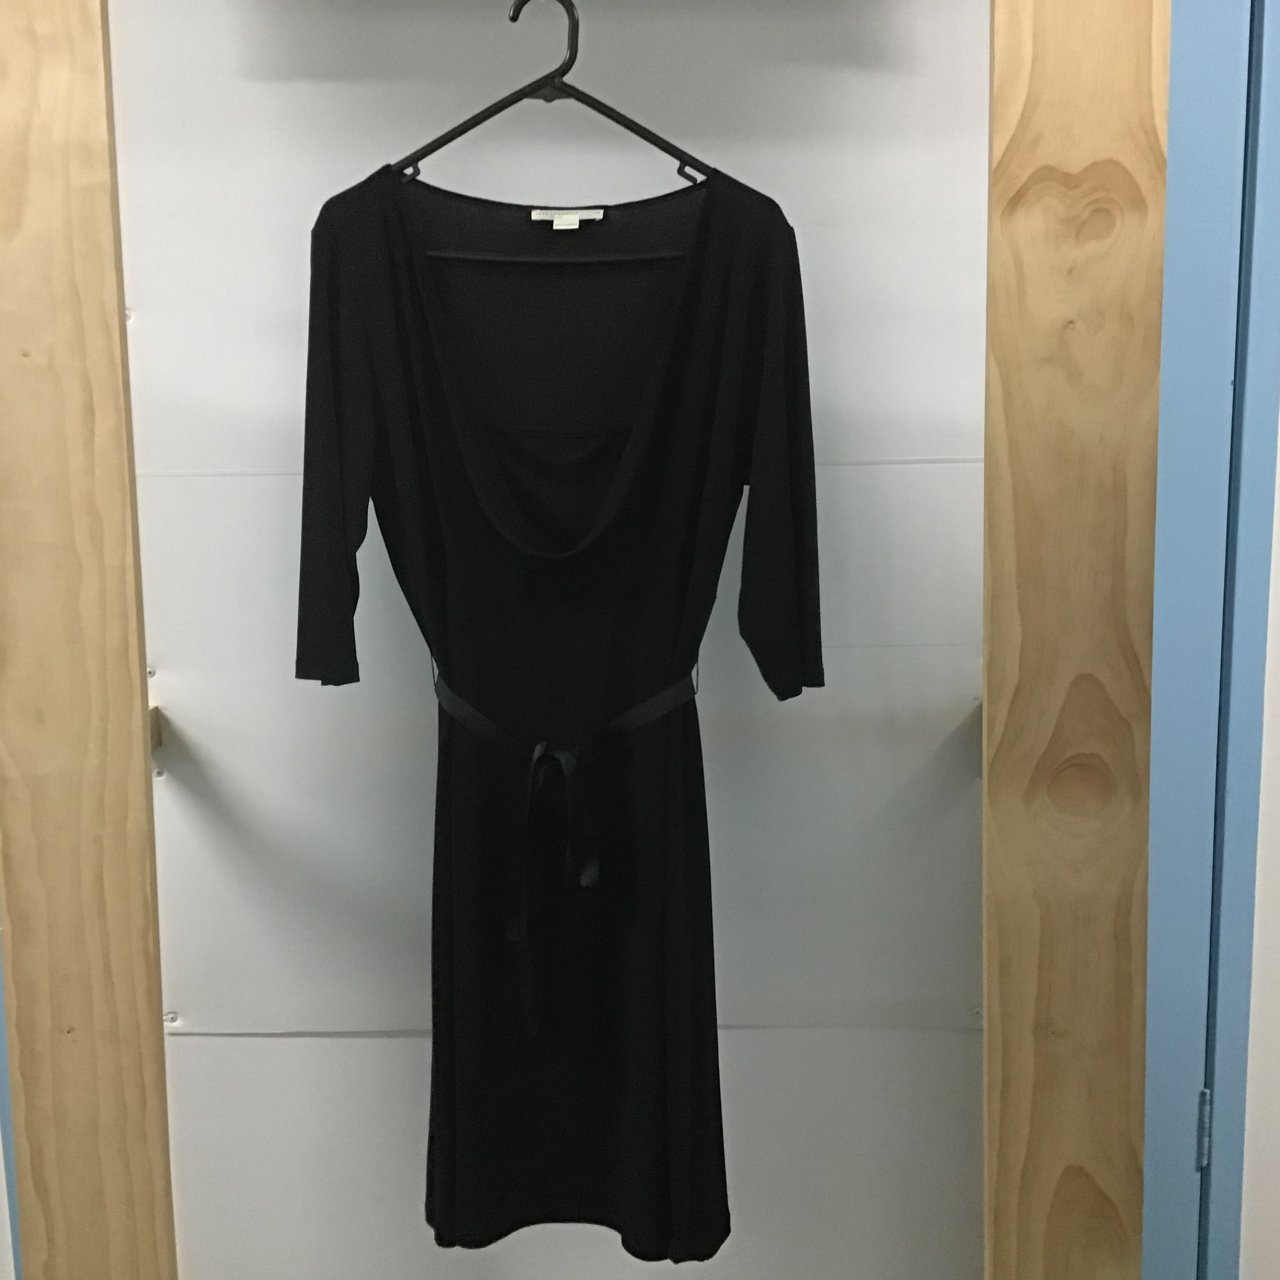 Jane Lamberton black dress with 3/4 sleeves.Cowl neck, size 14